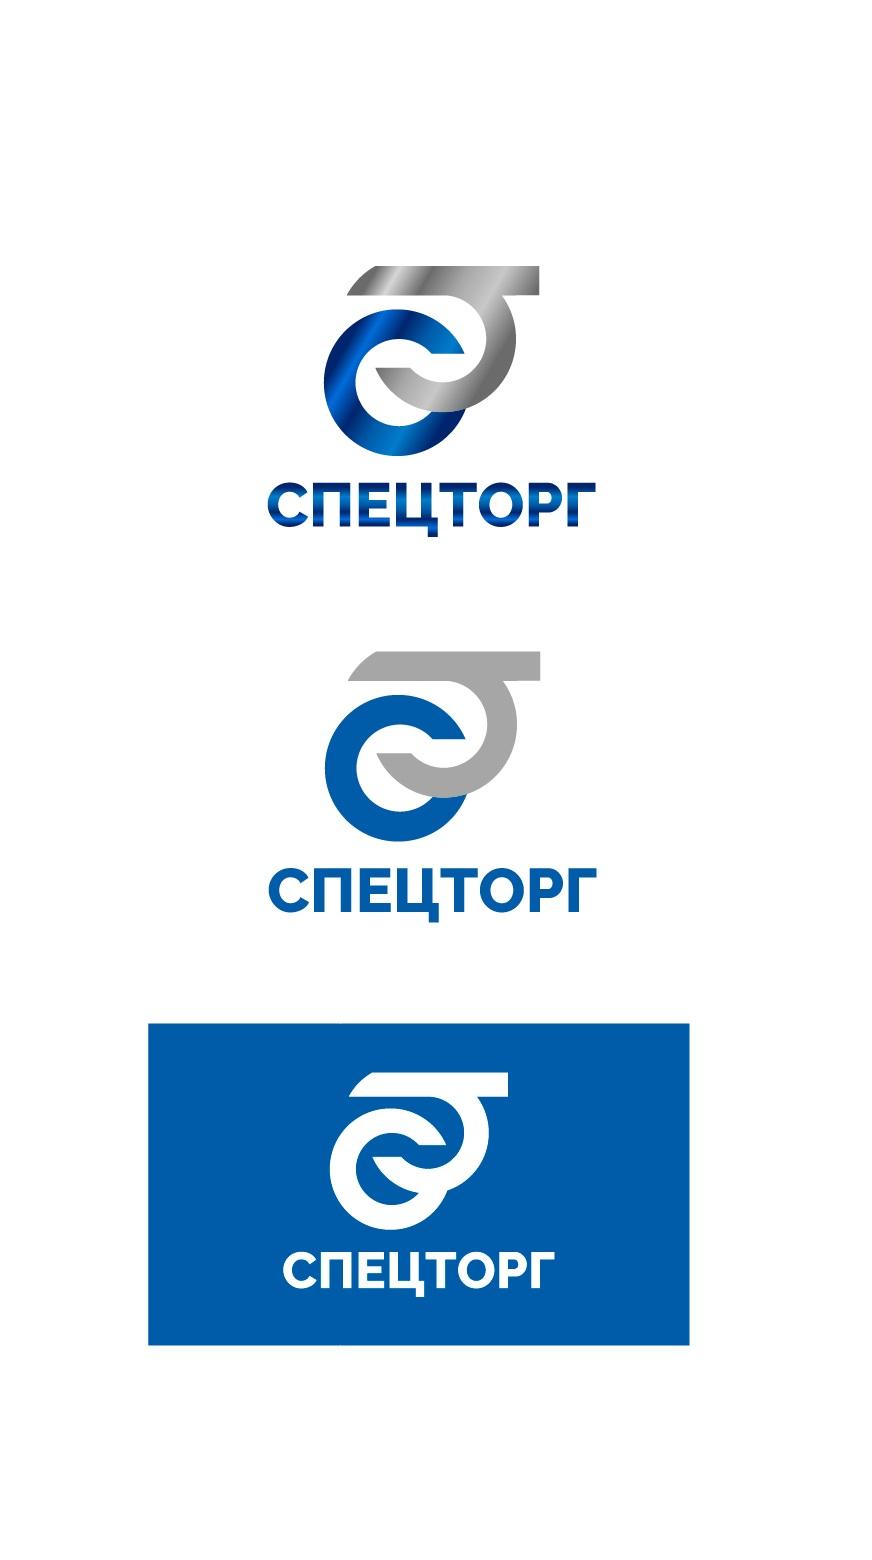 Разработать дизайн  логотипа компании фото f_2995dc2f53d0b170.jpg